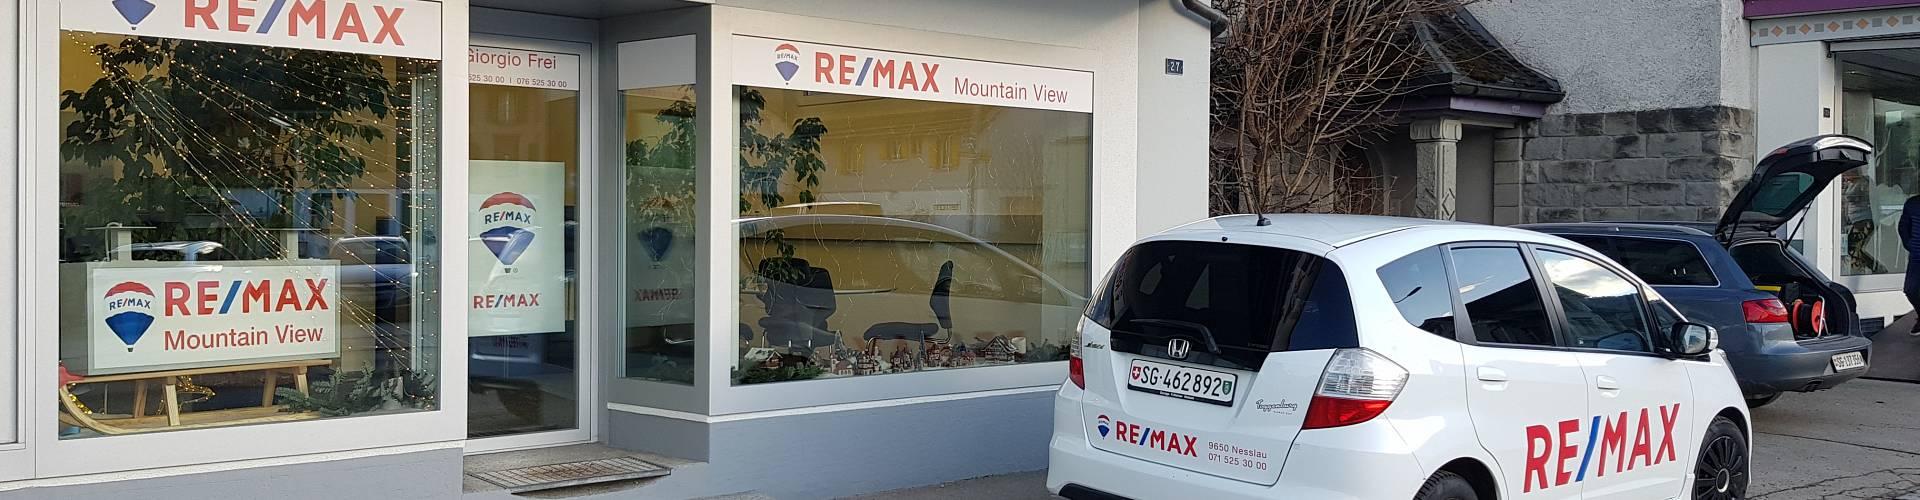 RE/MAX Immobilien Nesslau